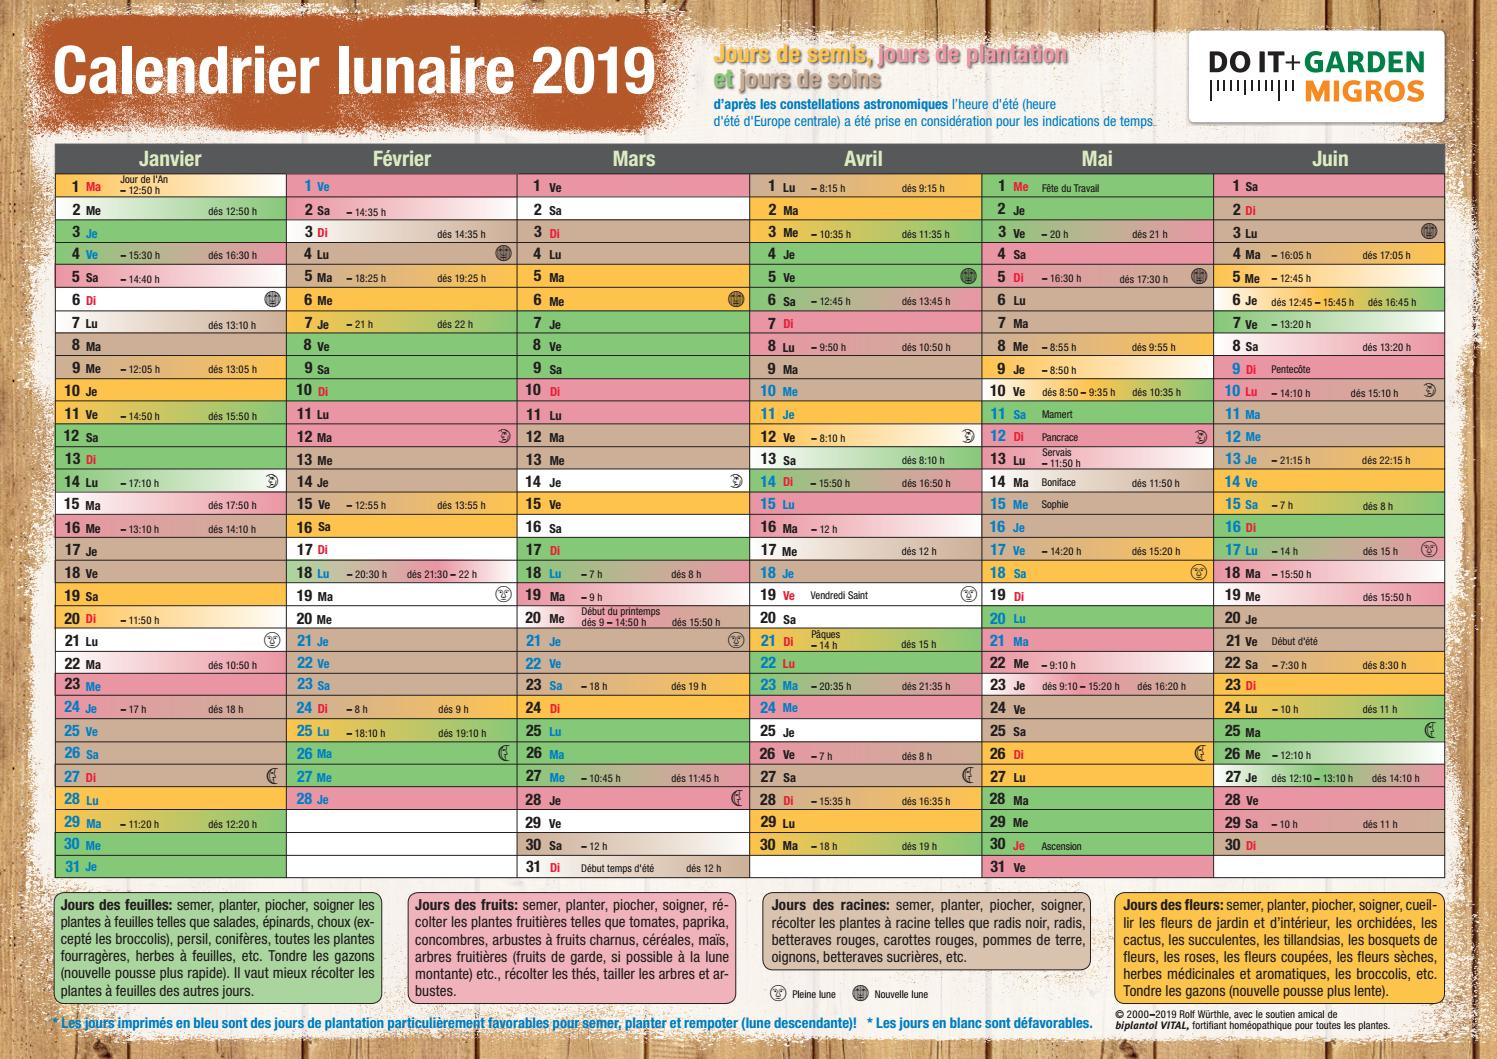 Calendrier Solunaire.Doit Mondkalender 2019 Fr By Migros Issuu